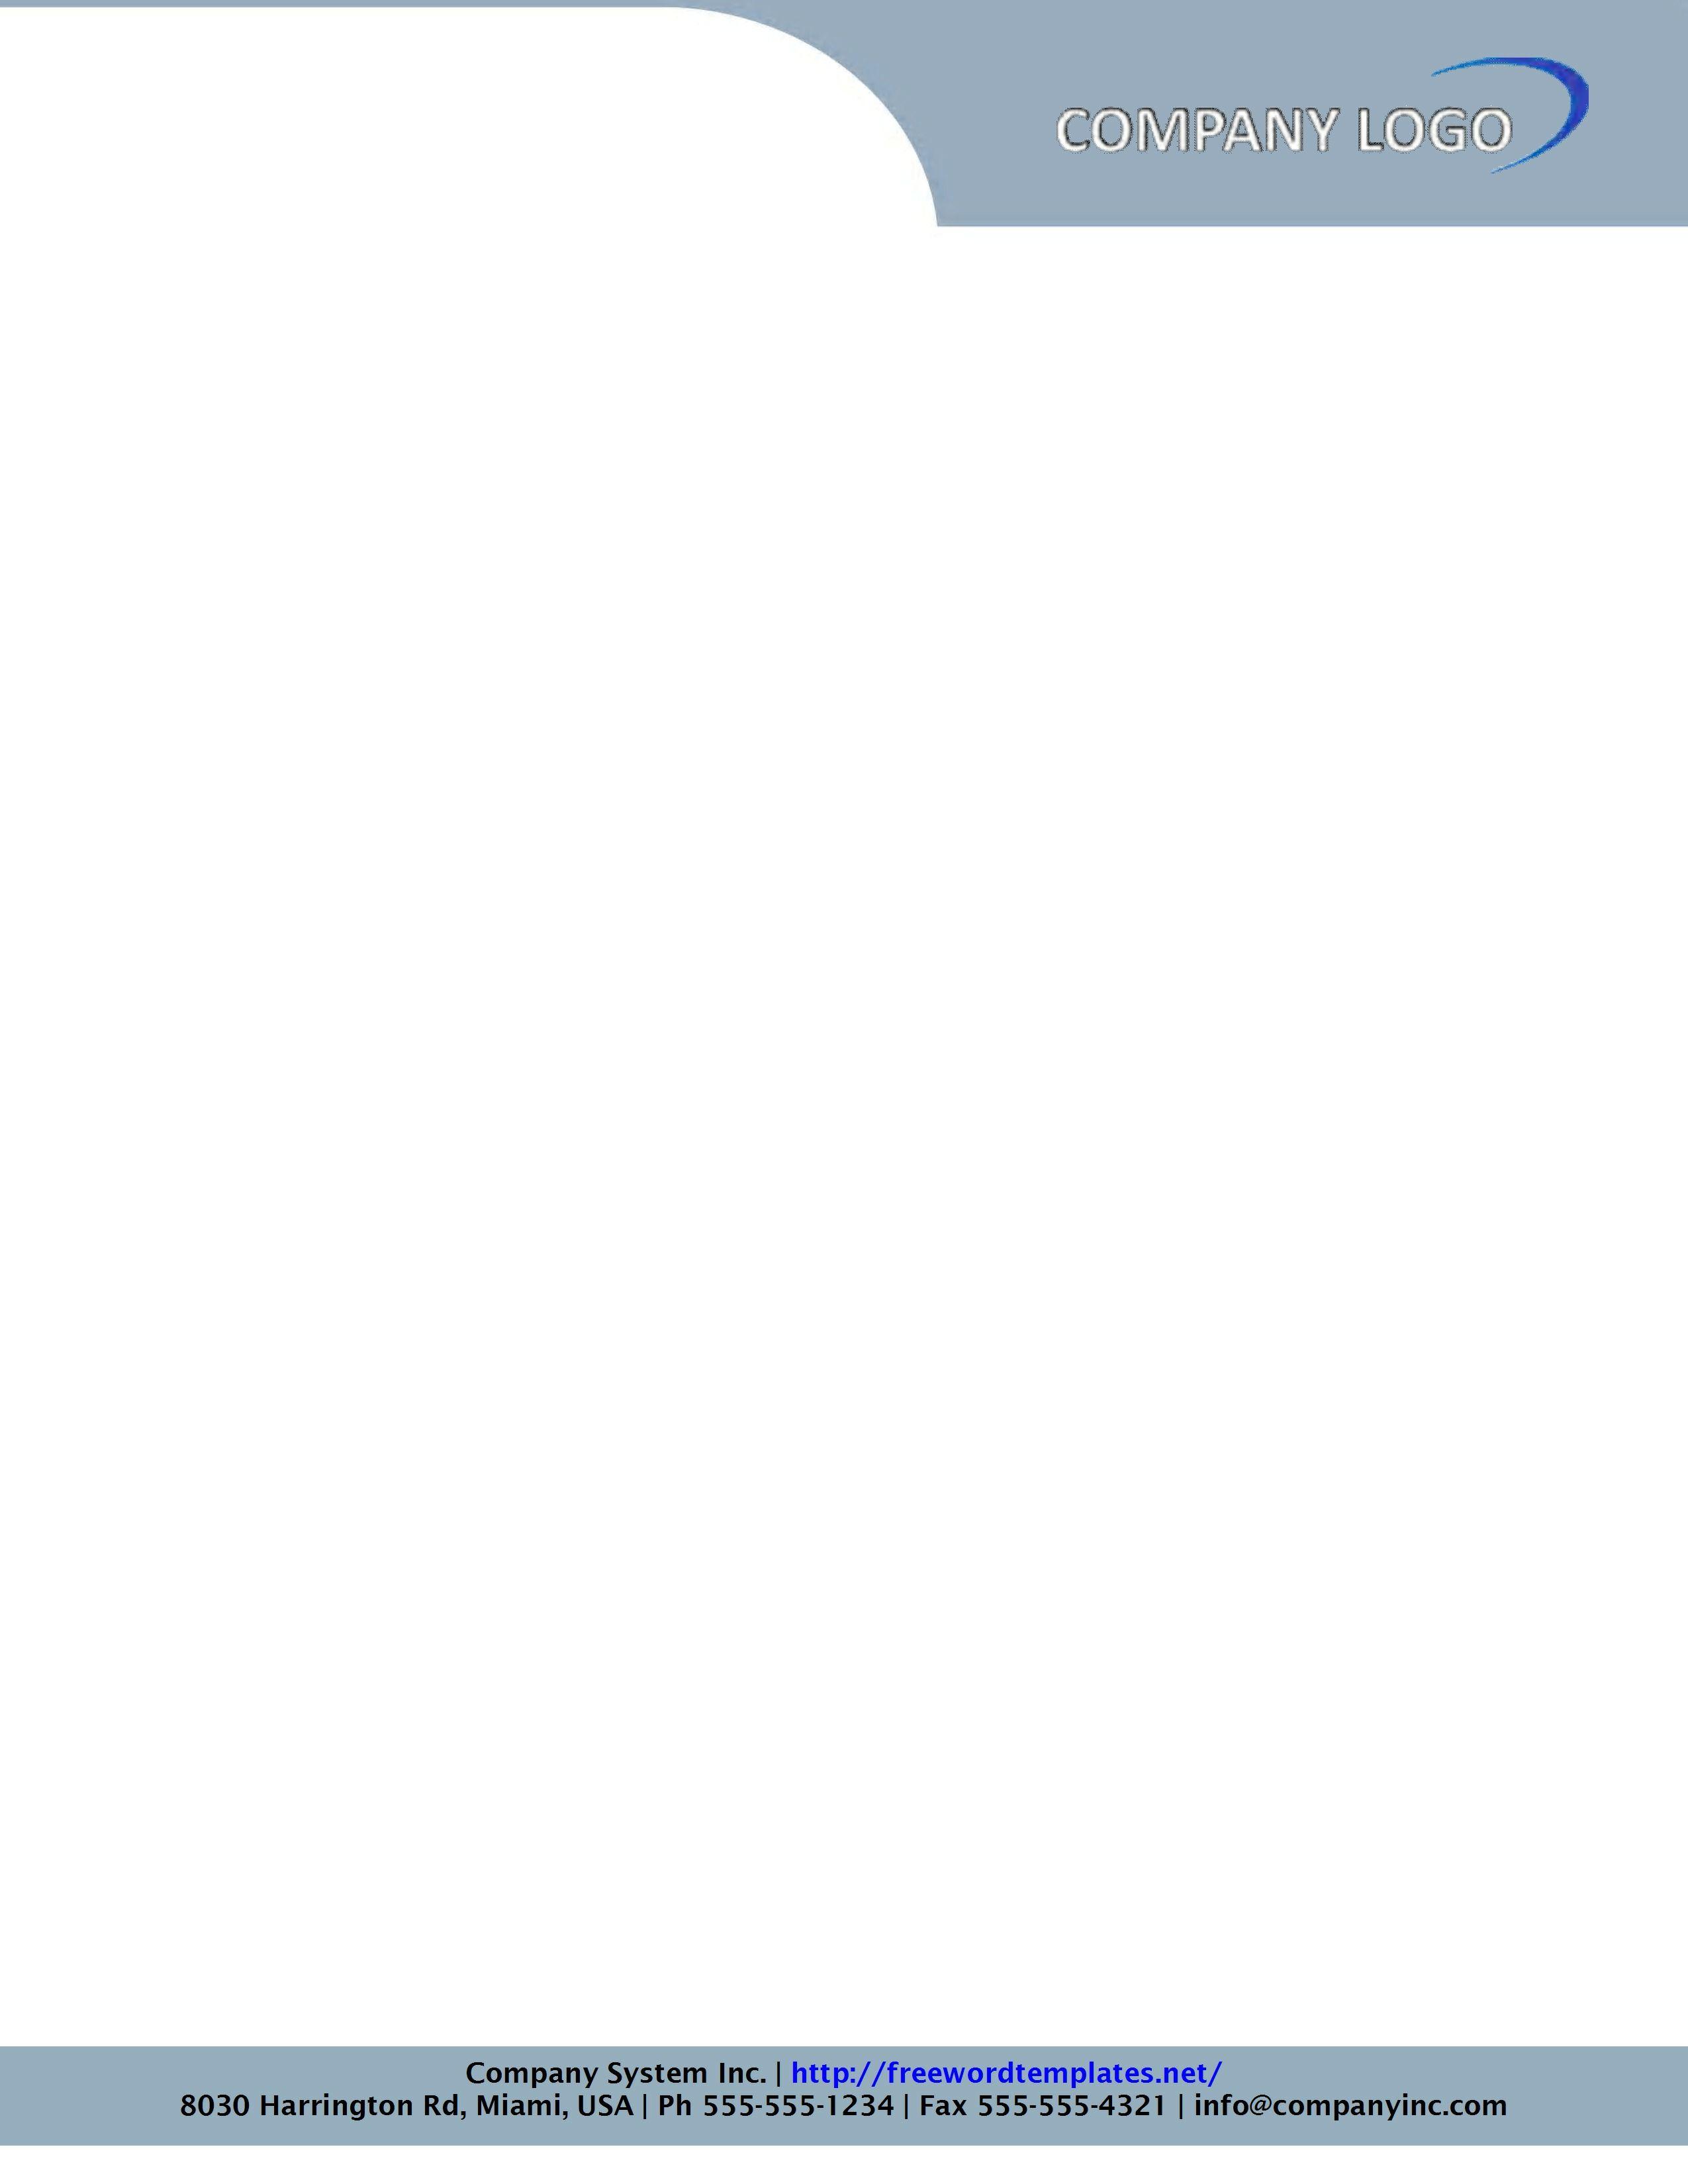 Letterhead Format Doc Free Download – Letterhead Format for Company